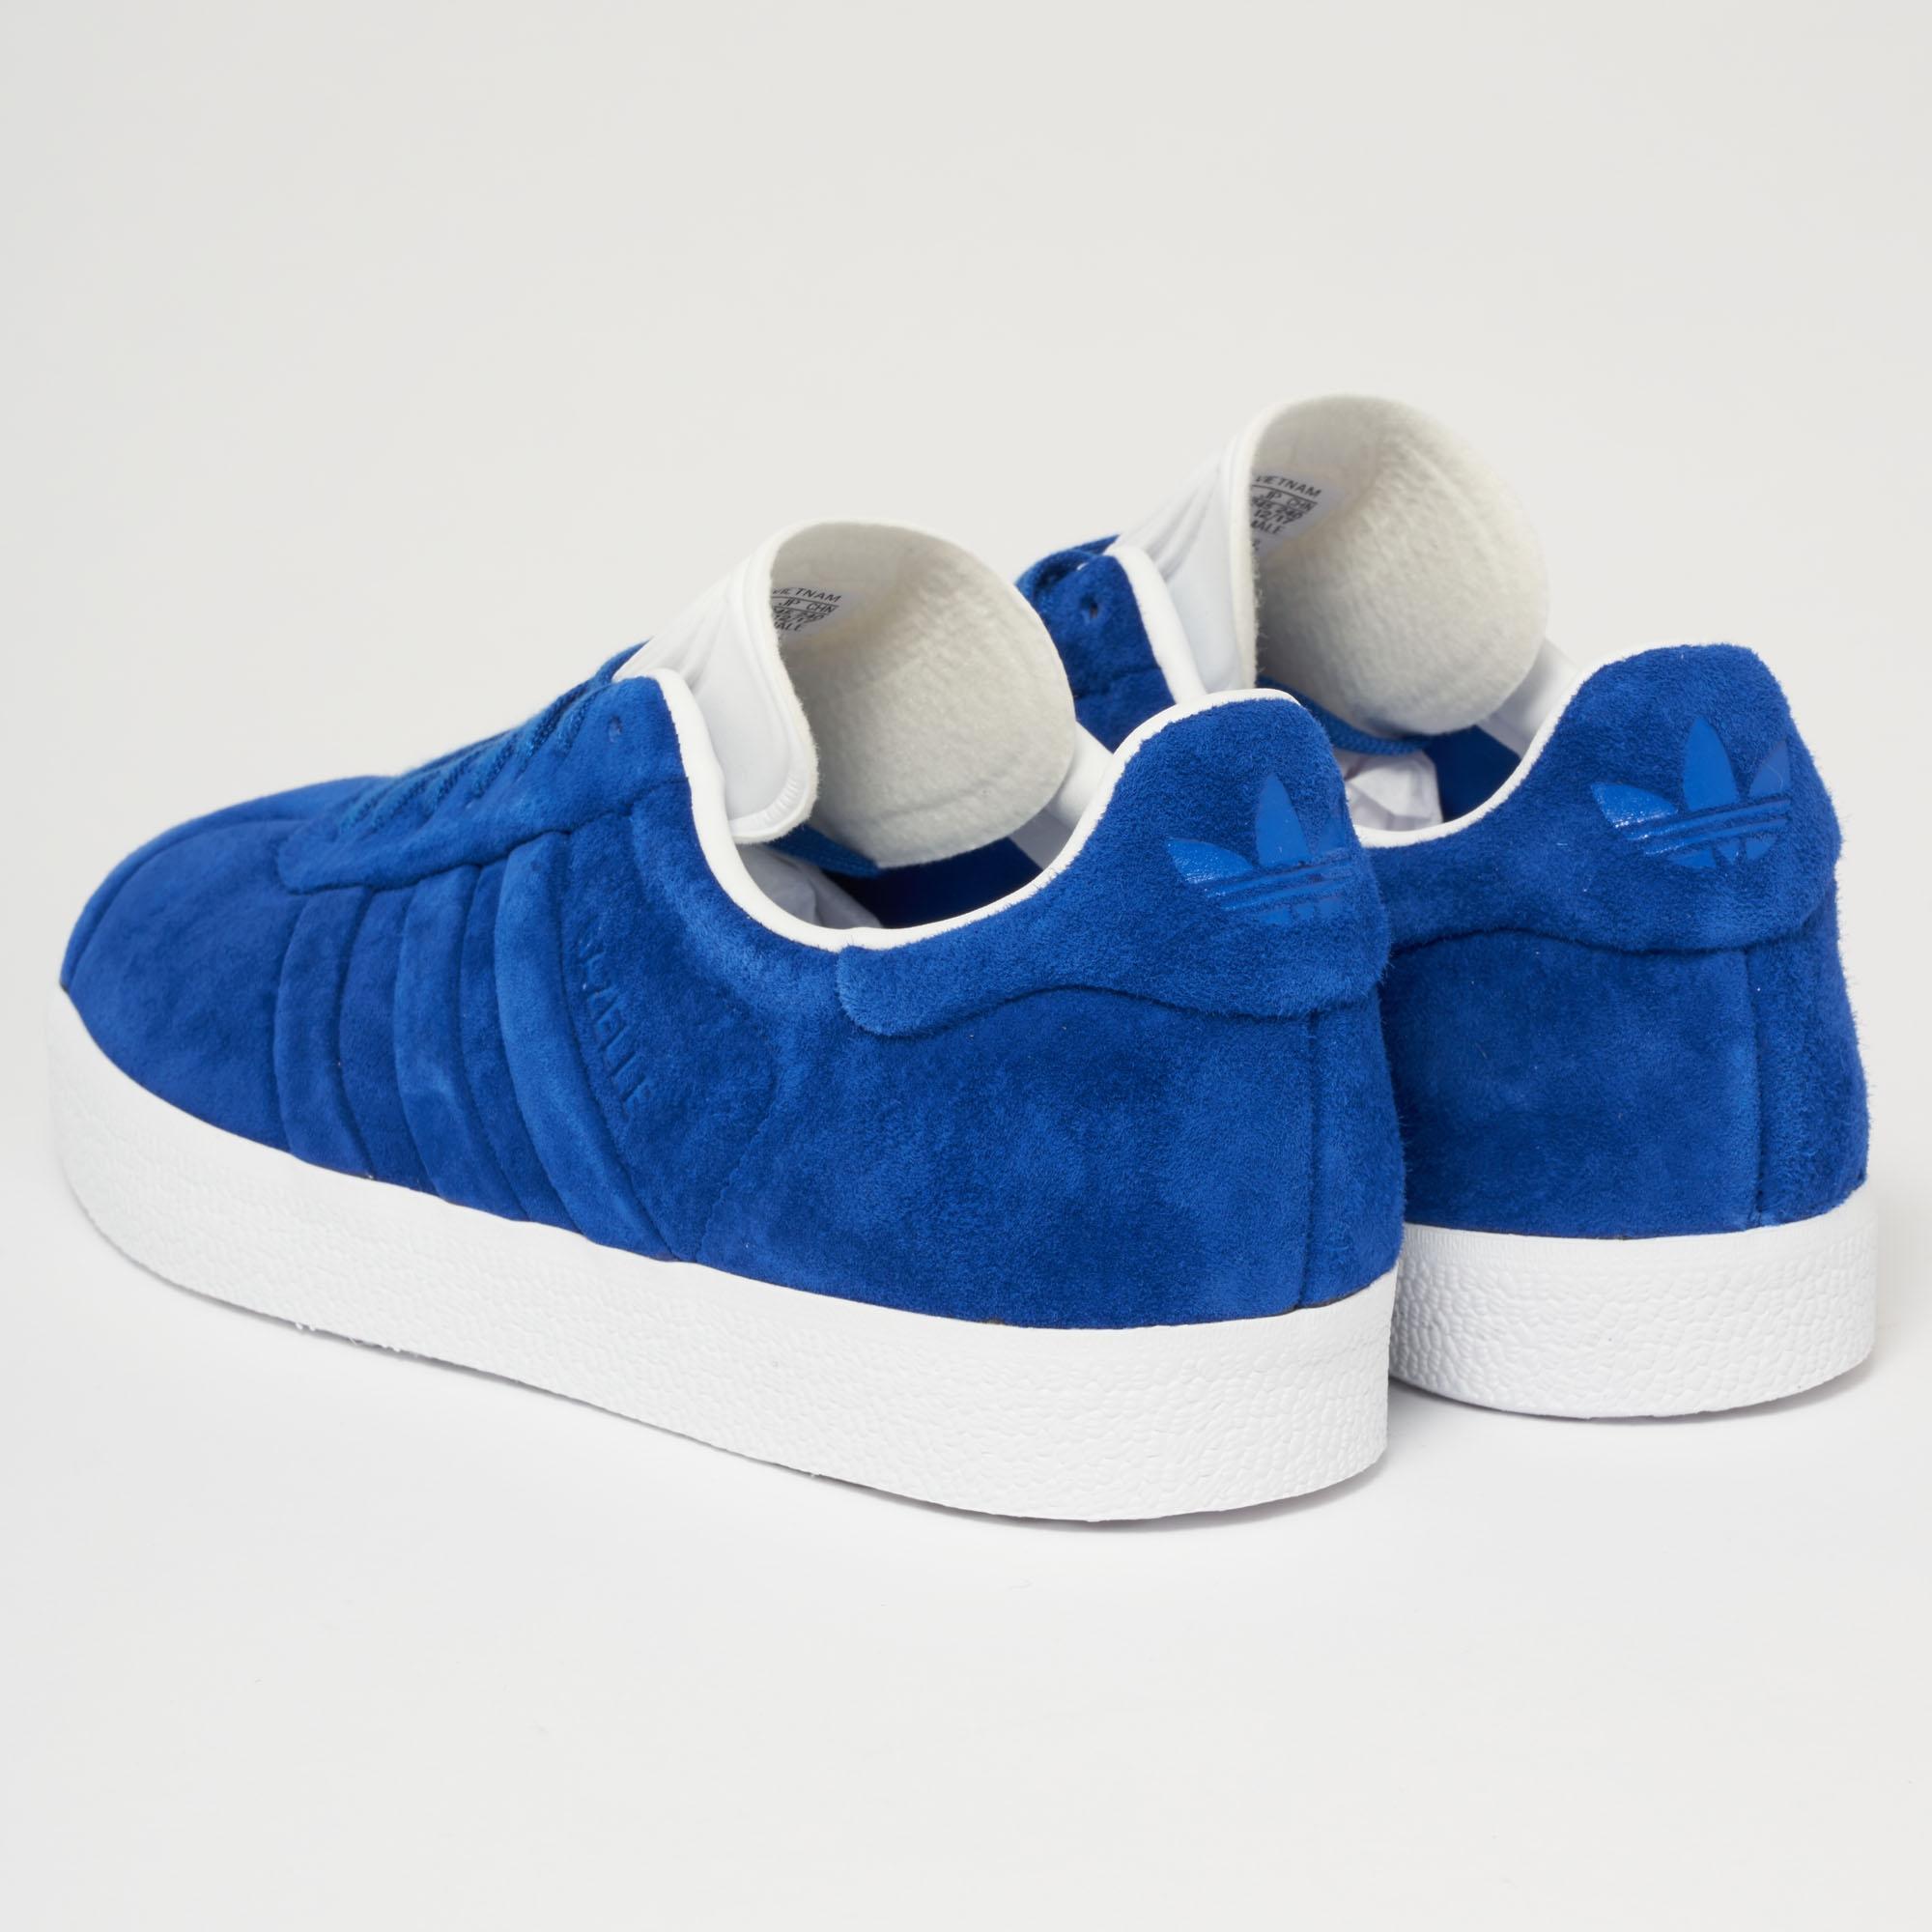 GAZELLE STITCH AND TURN - Sneaker low - collegiate royal/footwear white Spielraum Besten Billig Verkauf Footlocker Spielraum Fälschung Verkauf Für Billig aXPwf7P